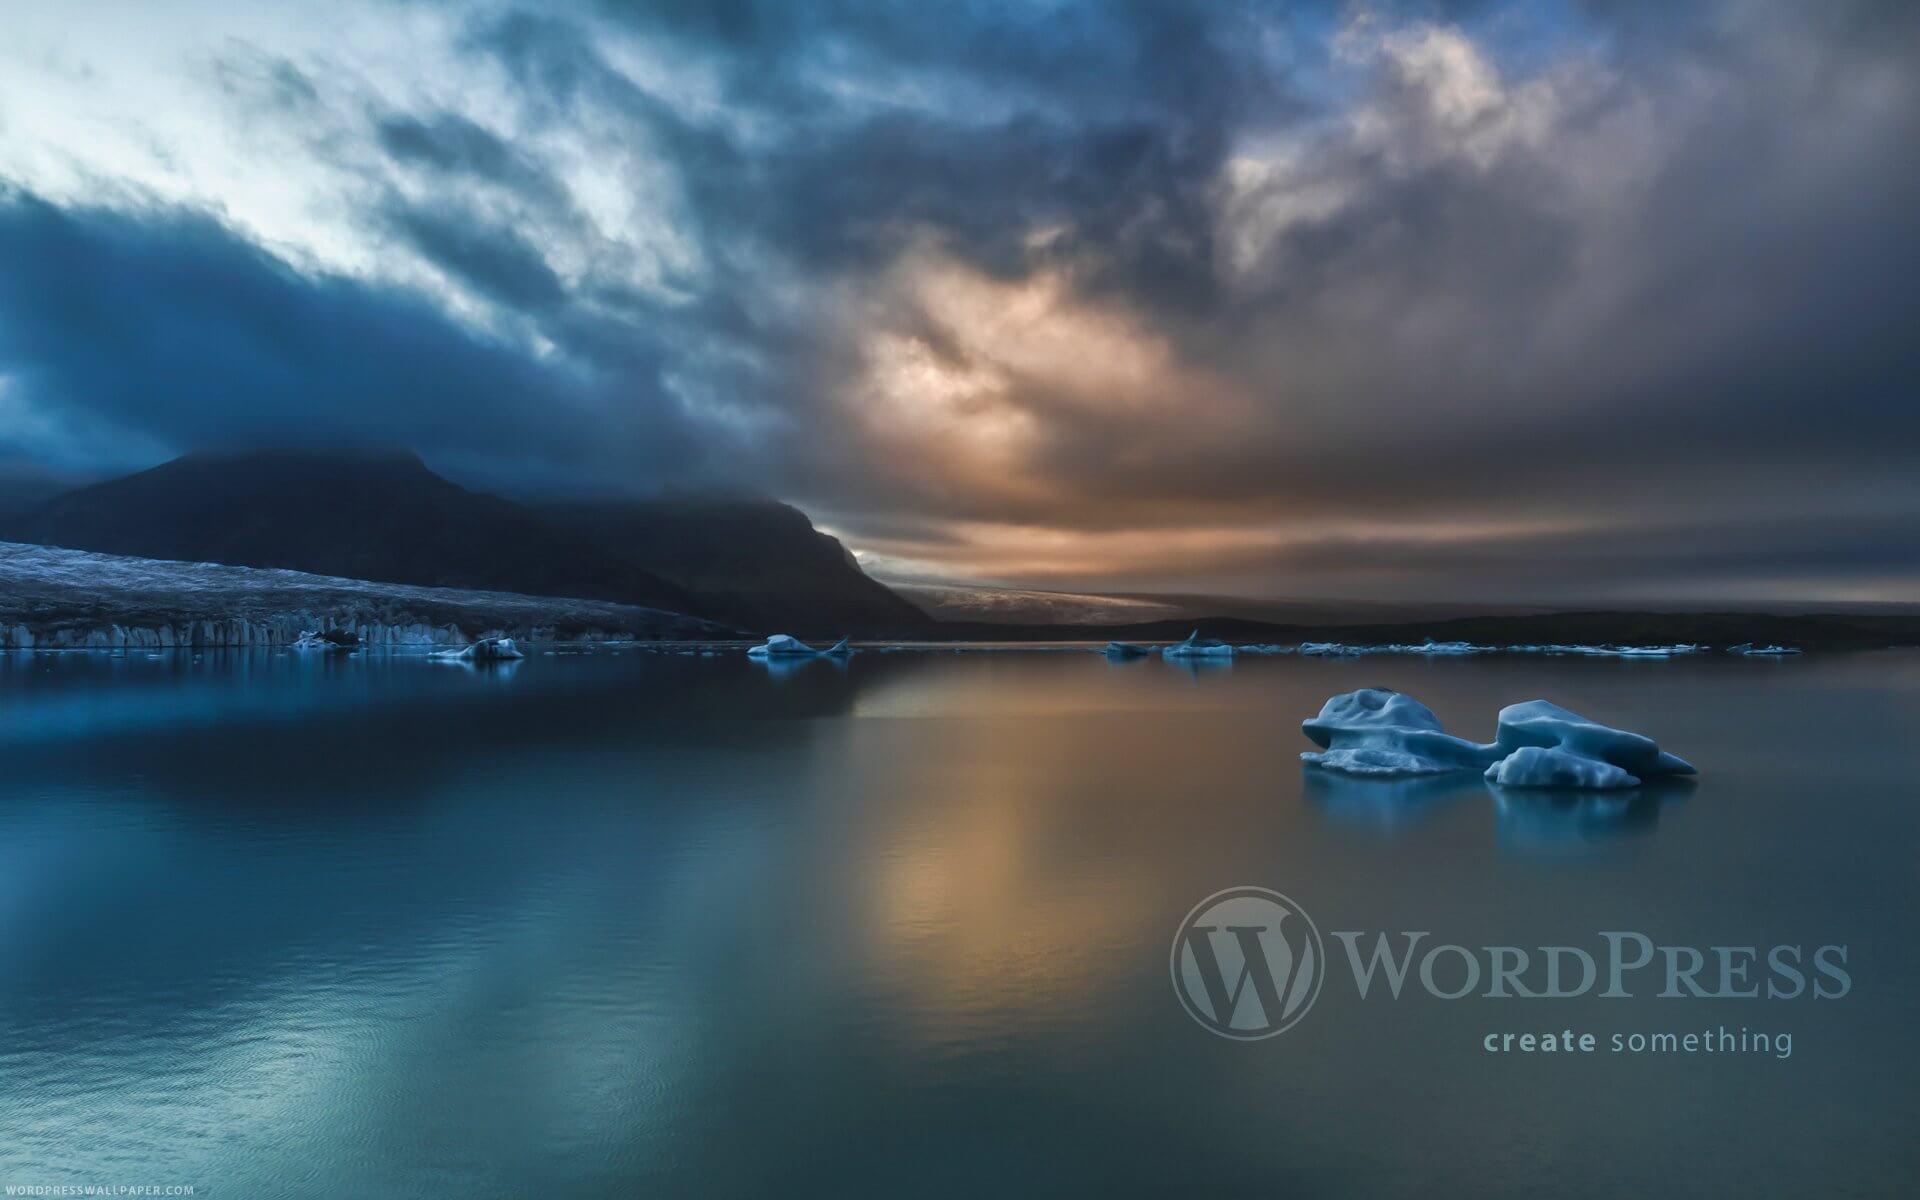 Wordpress wallpaper 2 - WordPress WallPapers